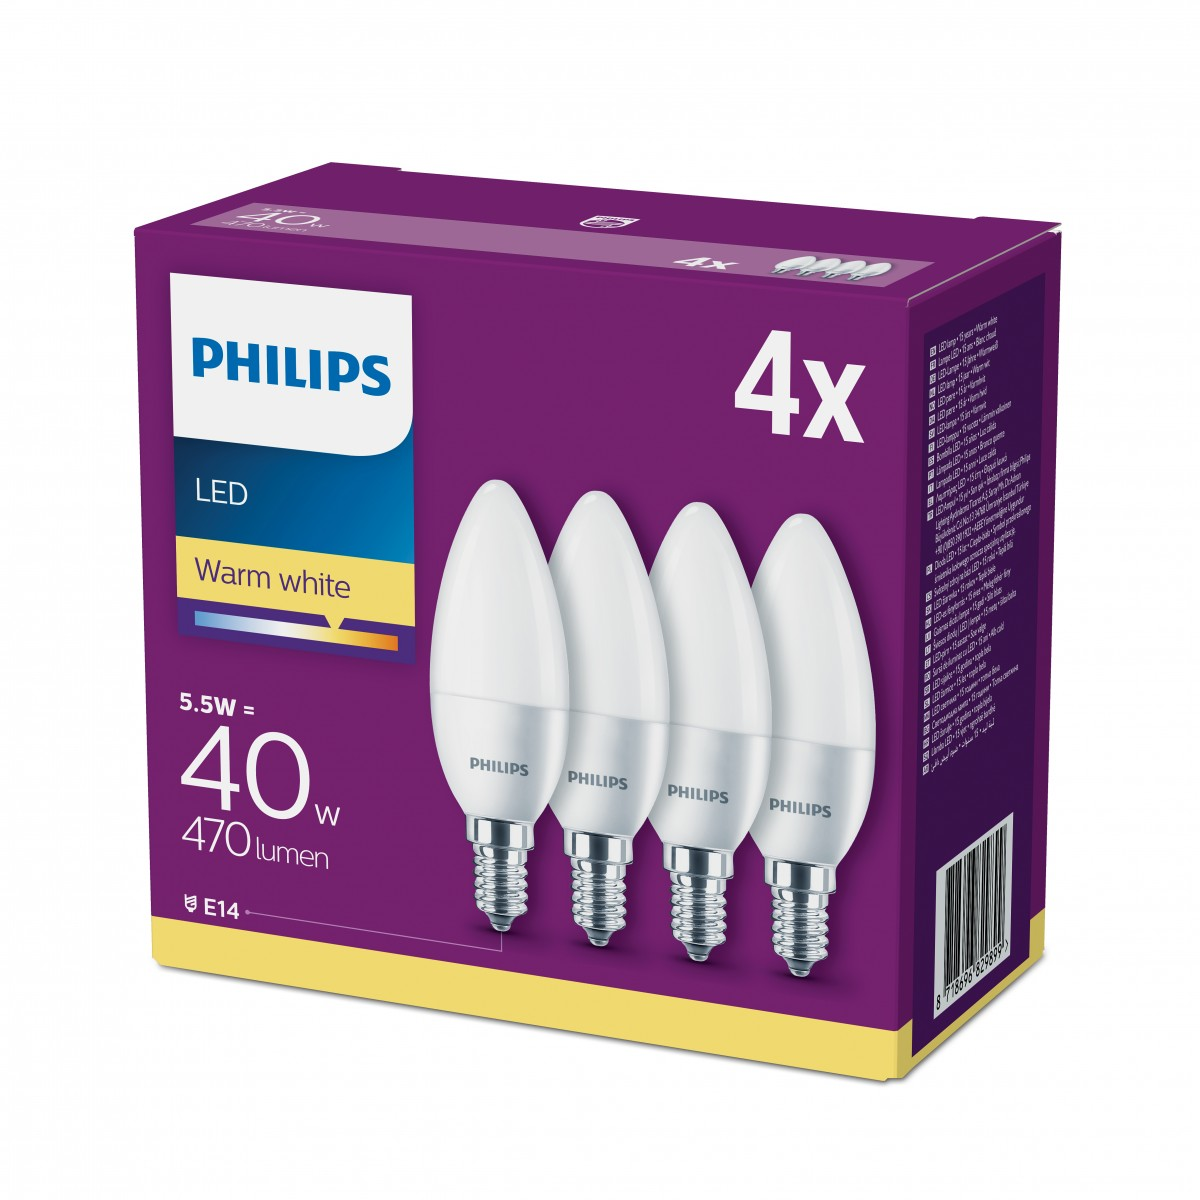 PHILIPS LED 40W kerte E14, varm hvid frostet pakke med 4 stk.